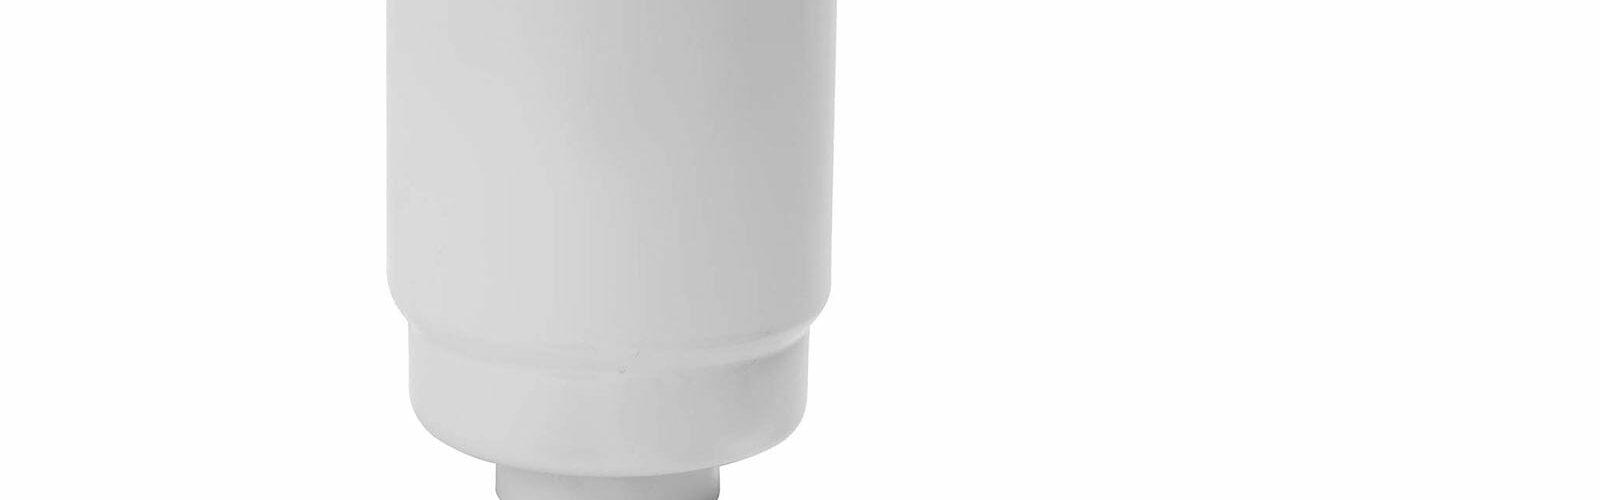 Best Duramax Fuel Filter